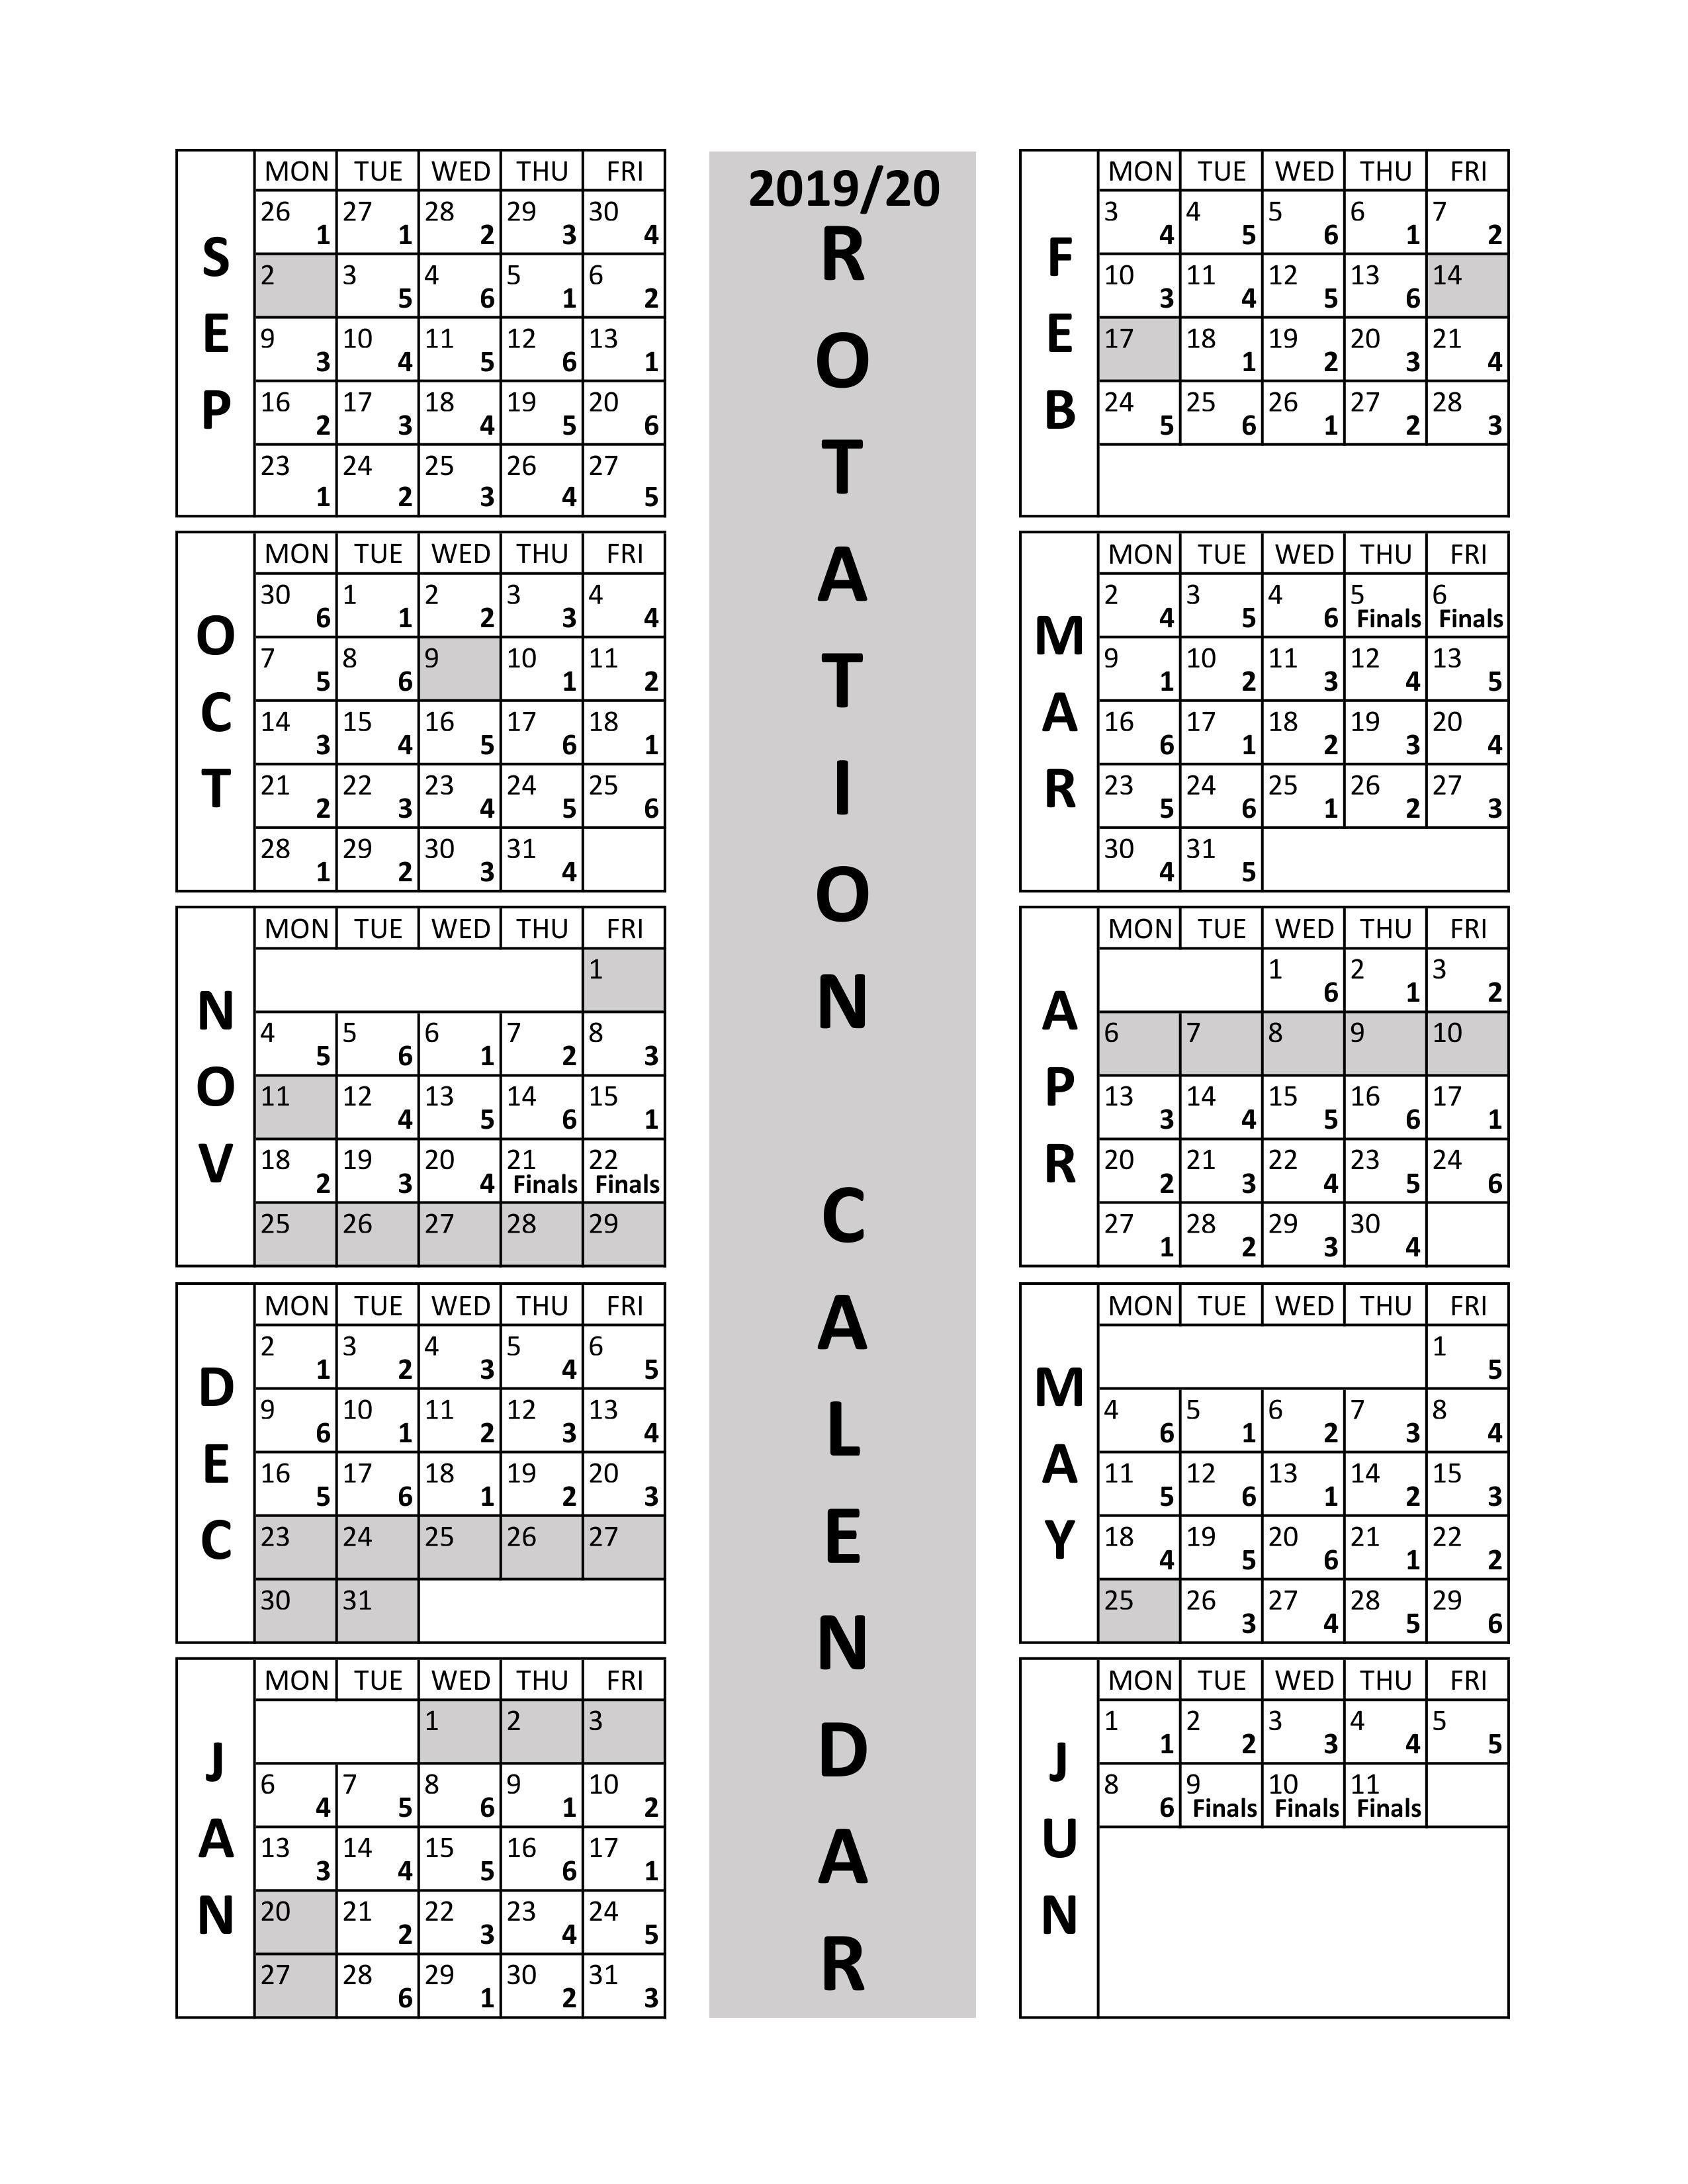 Svusd Calendar.Calendar Important Dates Saddleback Valley Unified School District